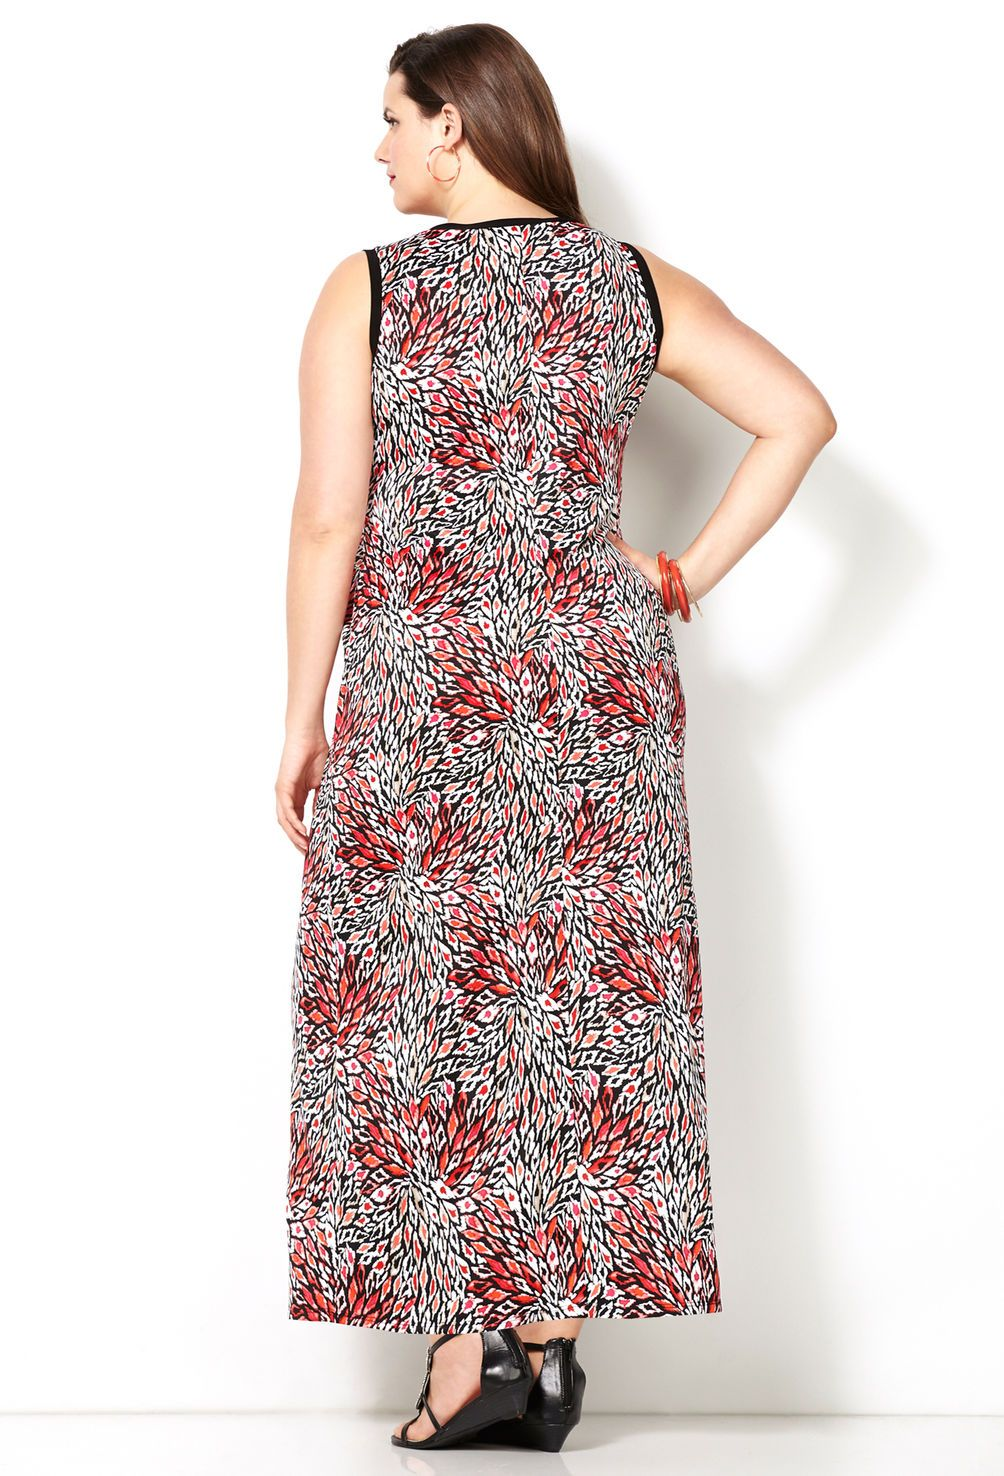 Coral Burst Maxi Dress-Plus Size Dress-Avenue | Sarah Slick ...